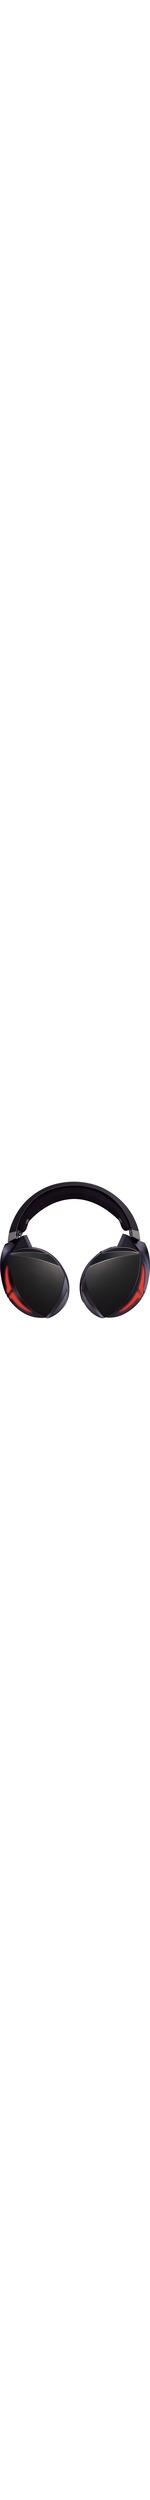 Asus ROG Strix Fusion 300 Headset